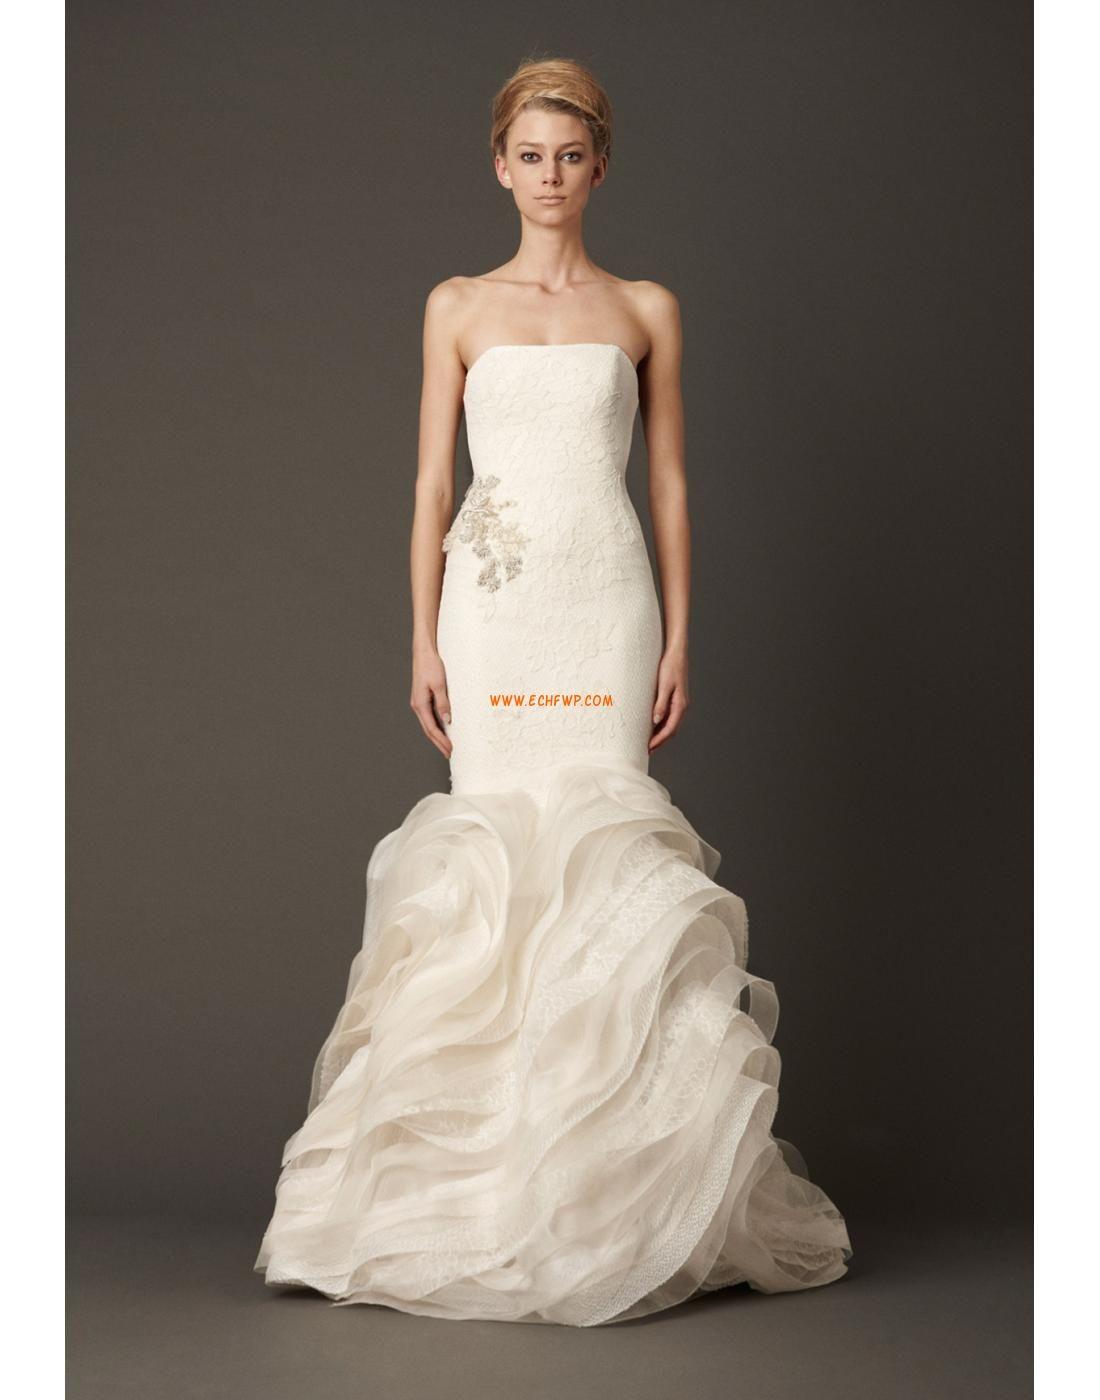 Strapless Tule Elegant & Luxe Bruidsmode 2014